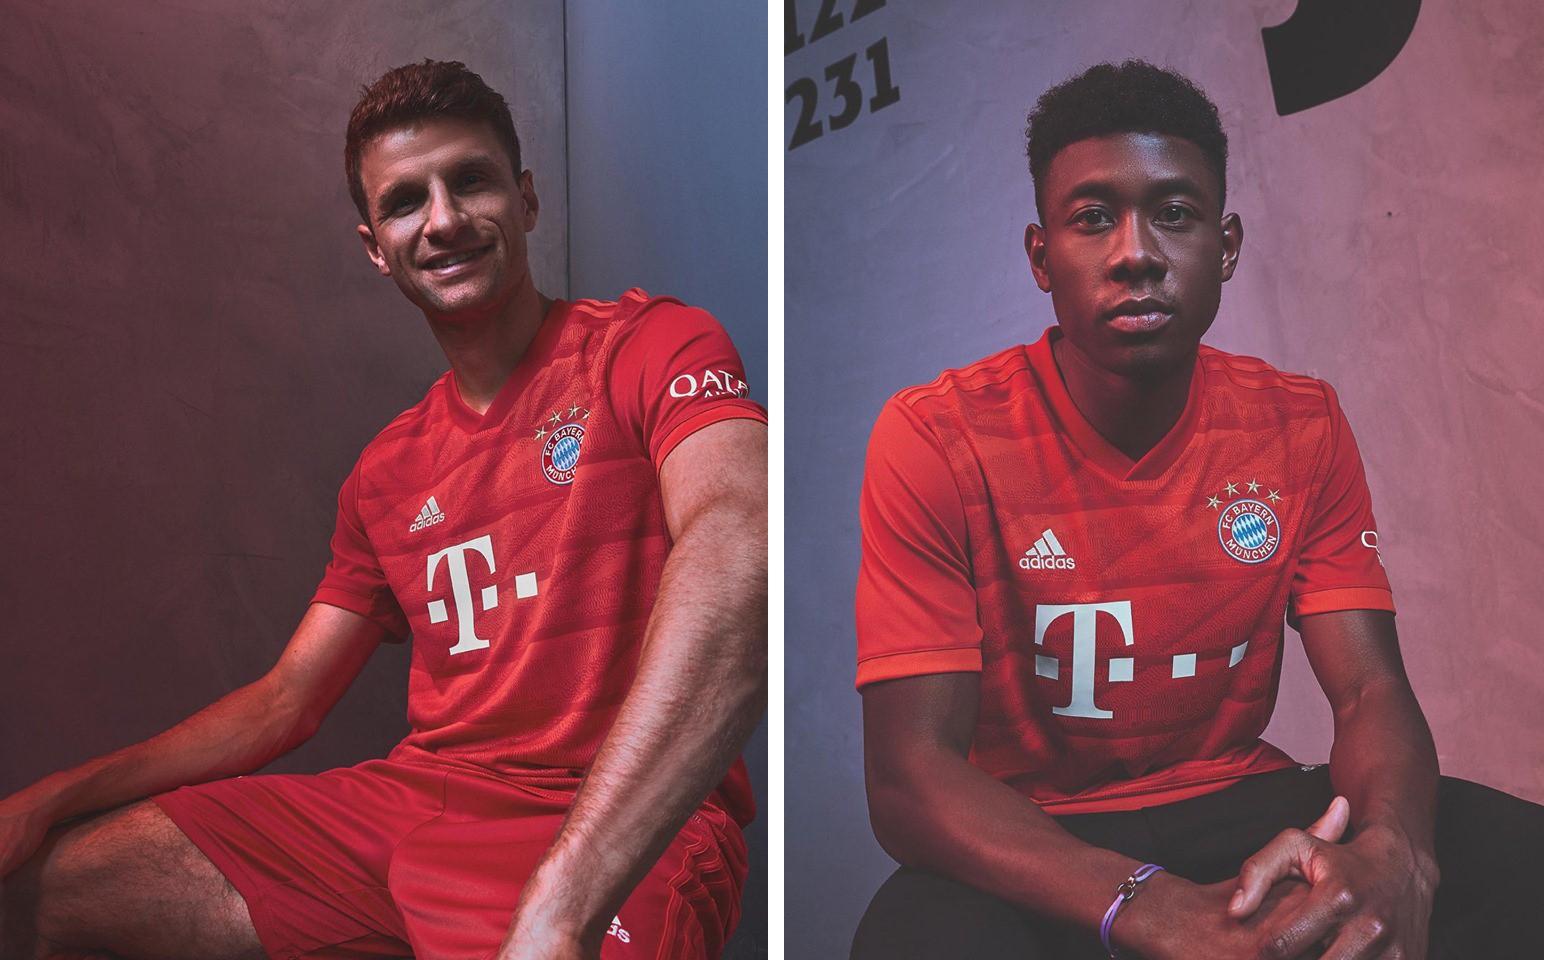 Новая форма Баварии Мюнхен 2019/2020